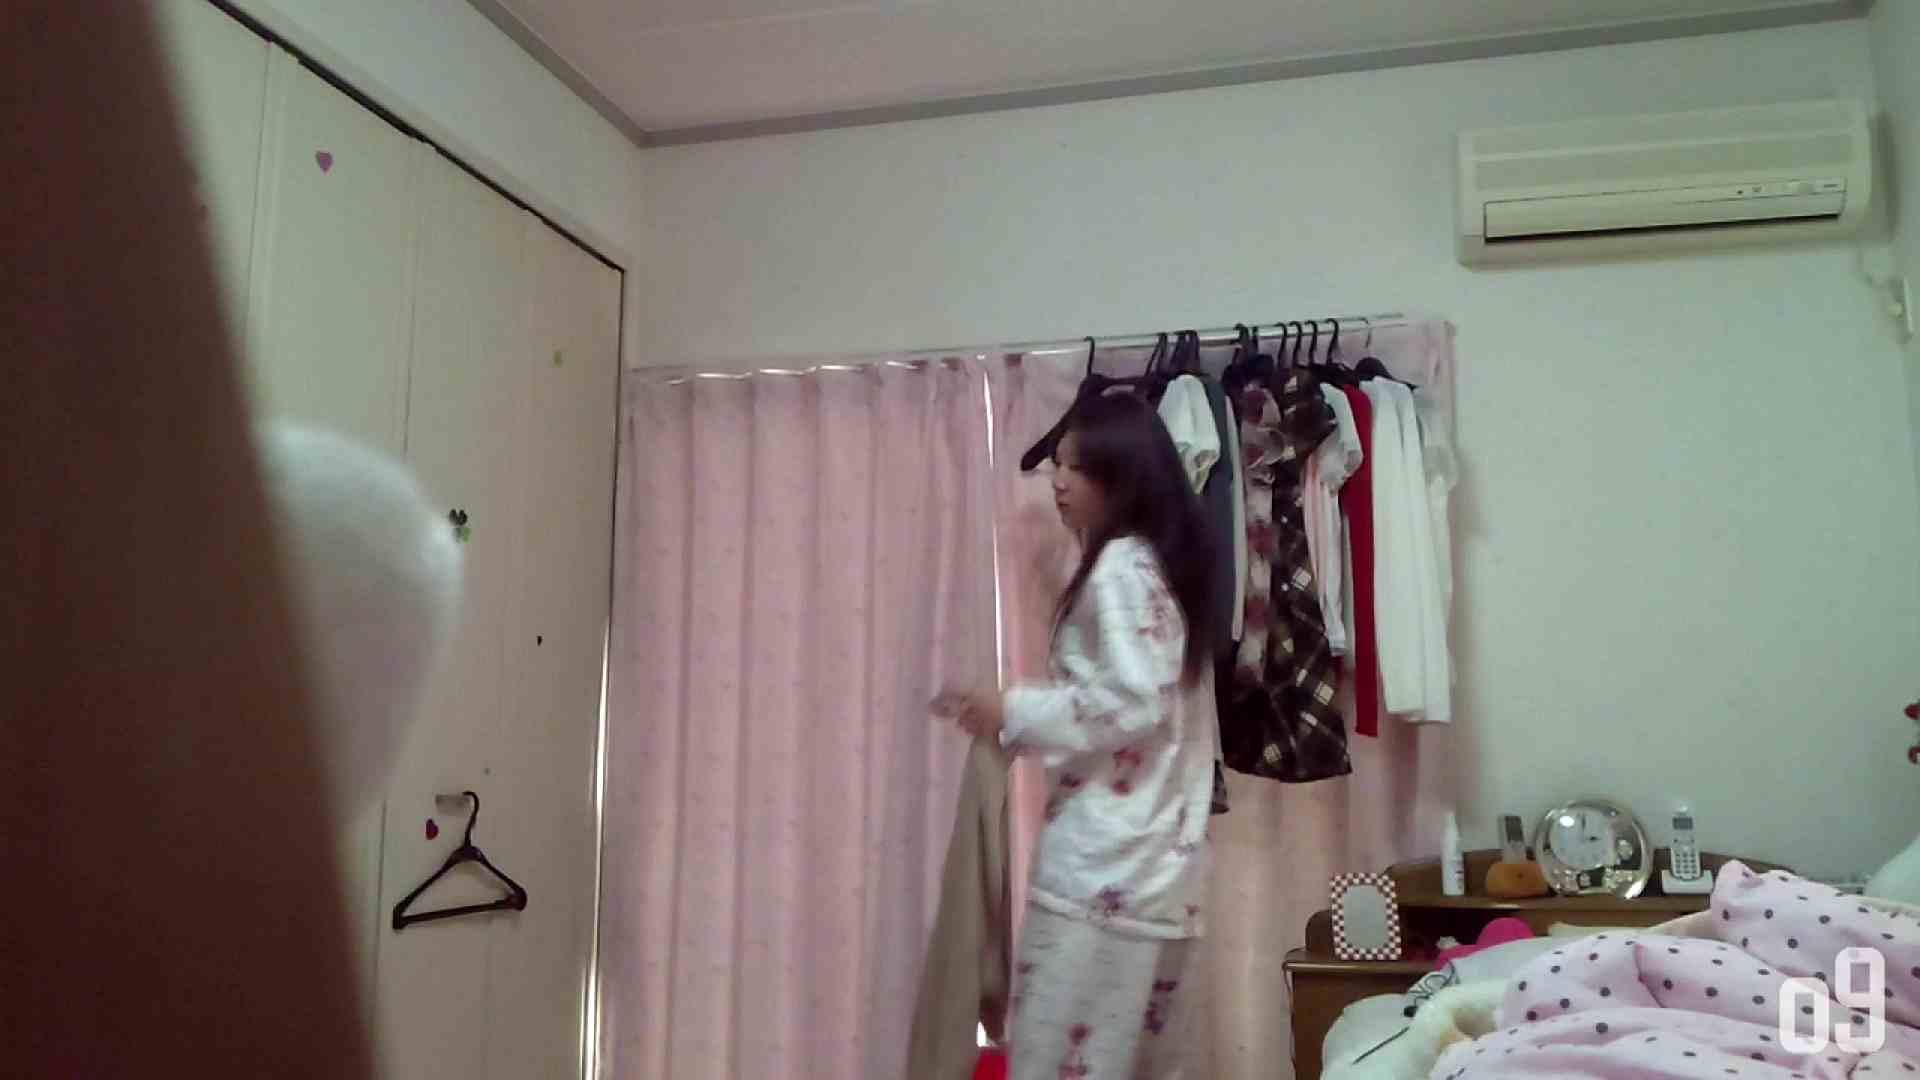 vol.2 瑞希ちゃんの自宅公開!寝起きの着替え・・・ラリルそー 美女OL | 着替え  44連発 11